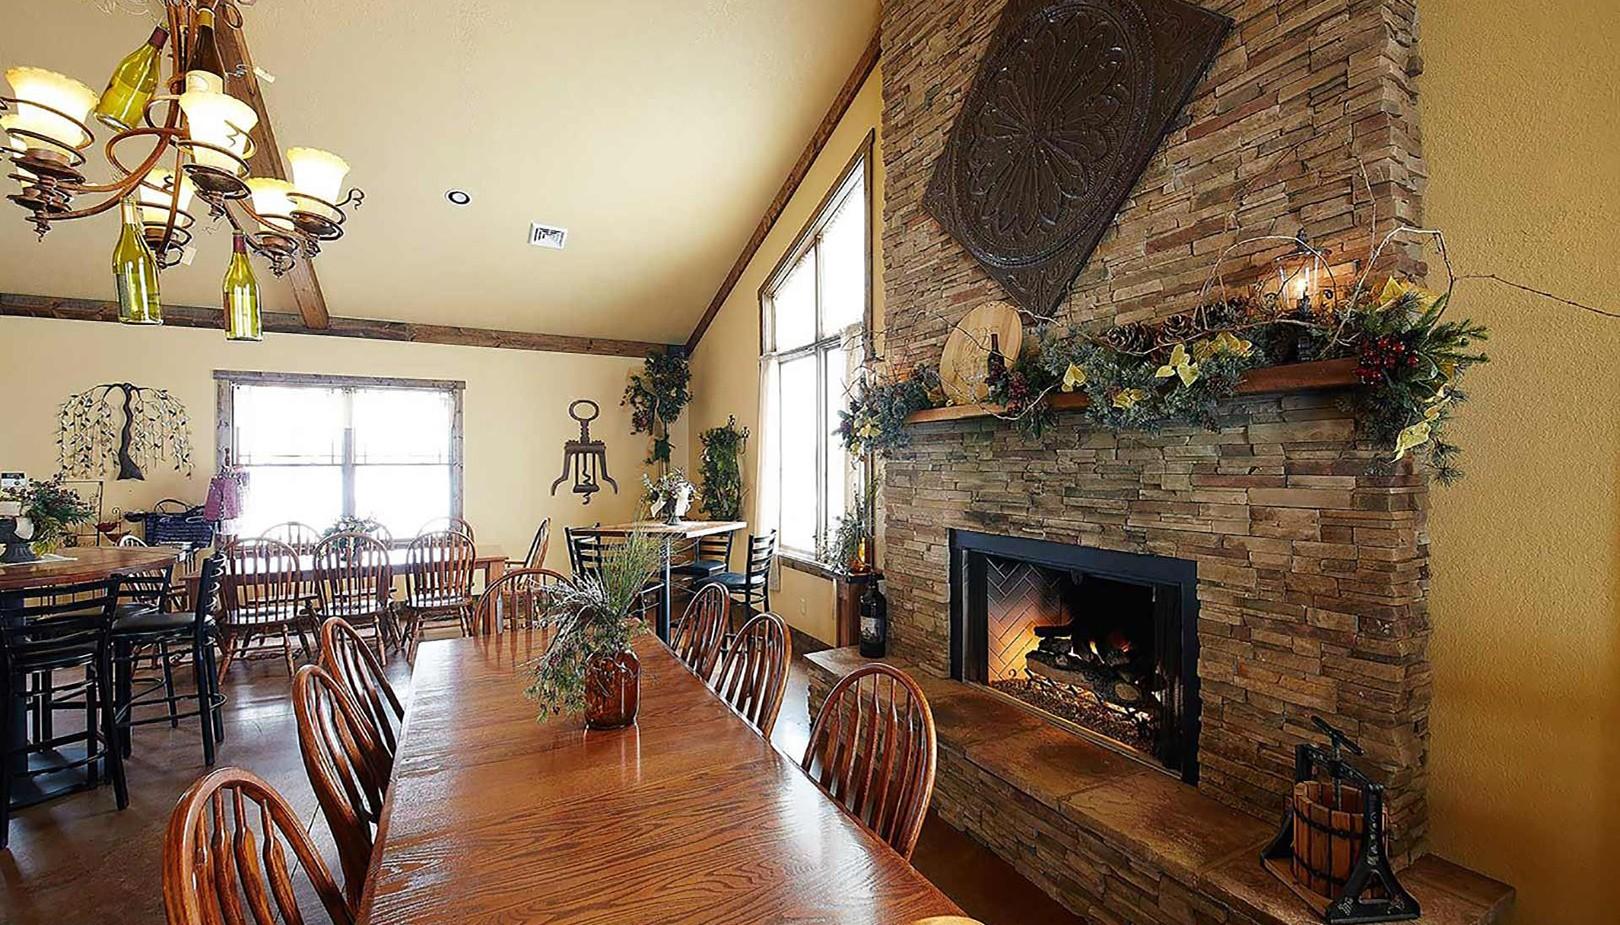 willow-ridge-winery-tasting-room-lakewood-il-1920-1080